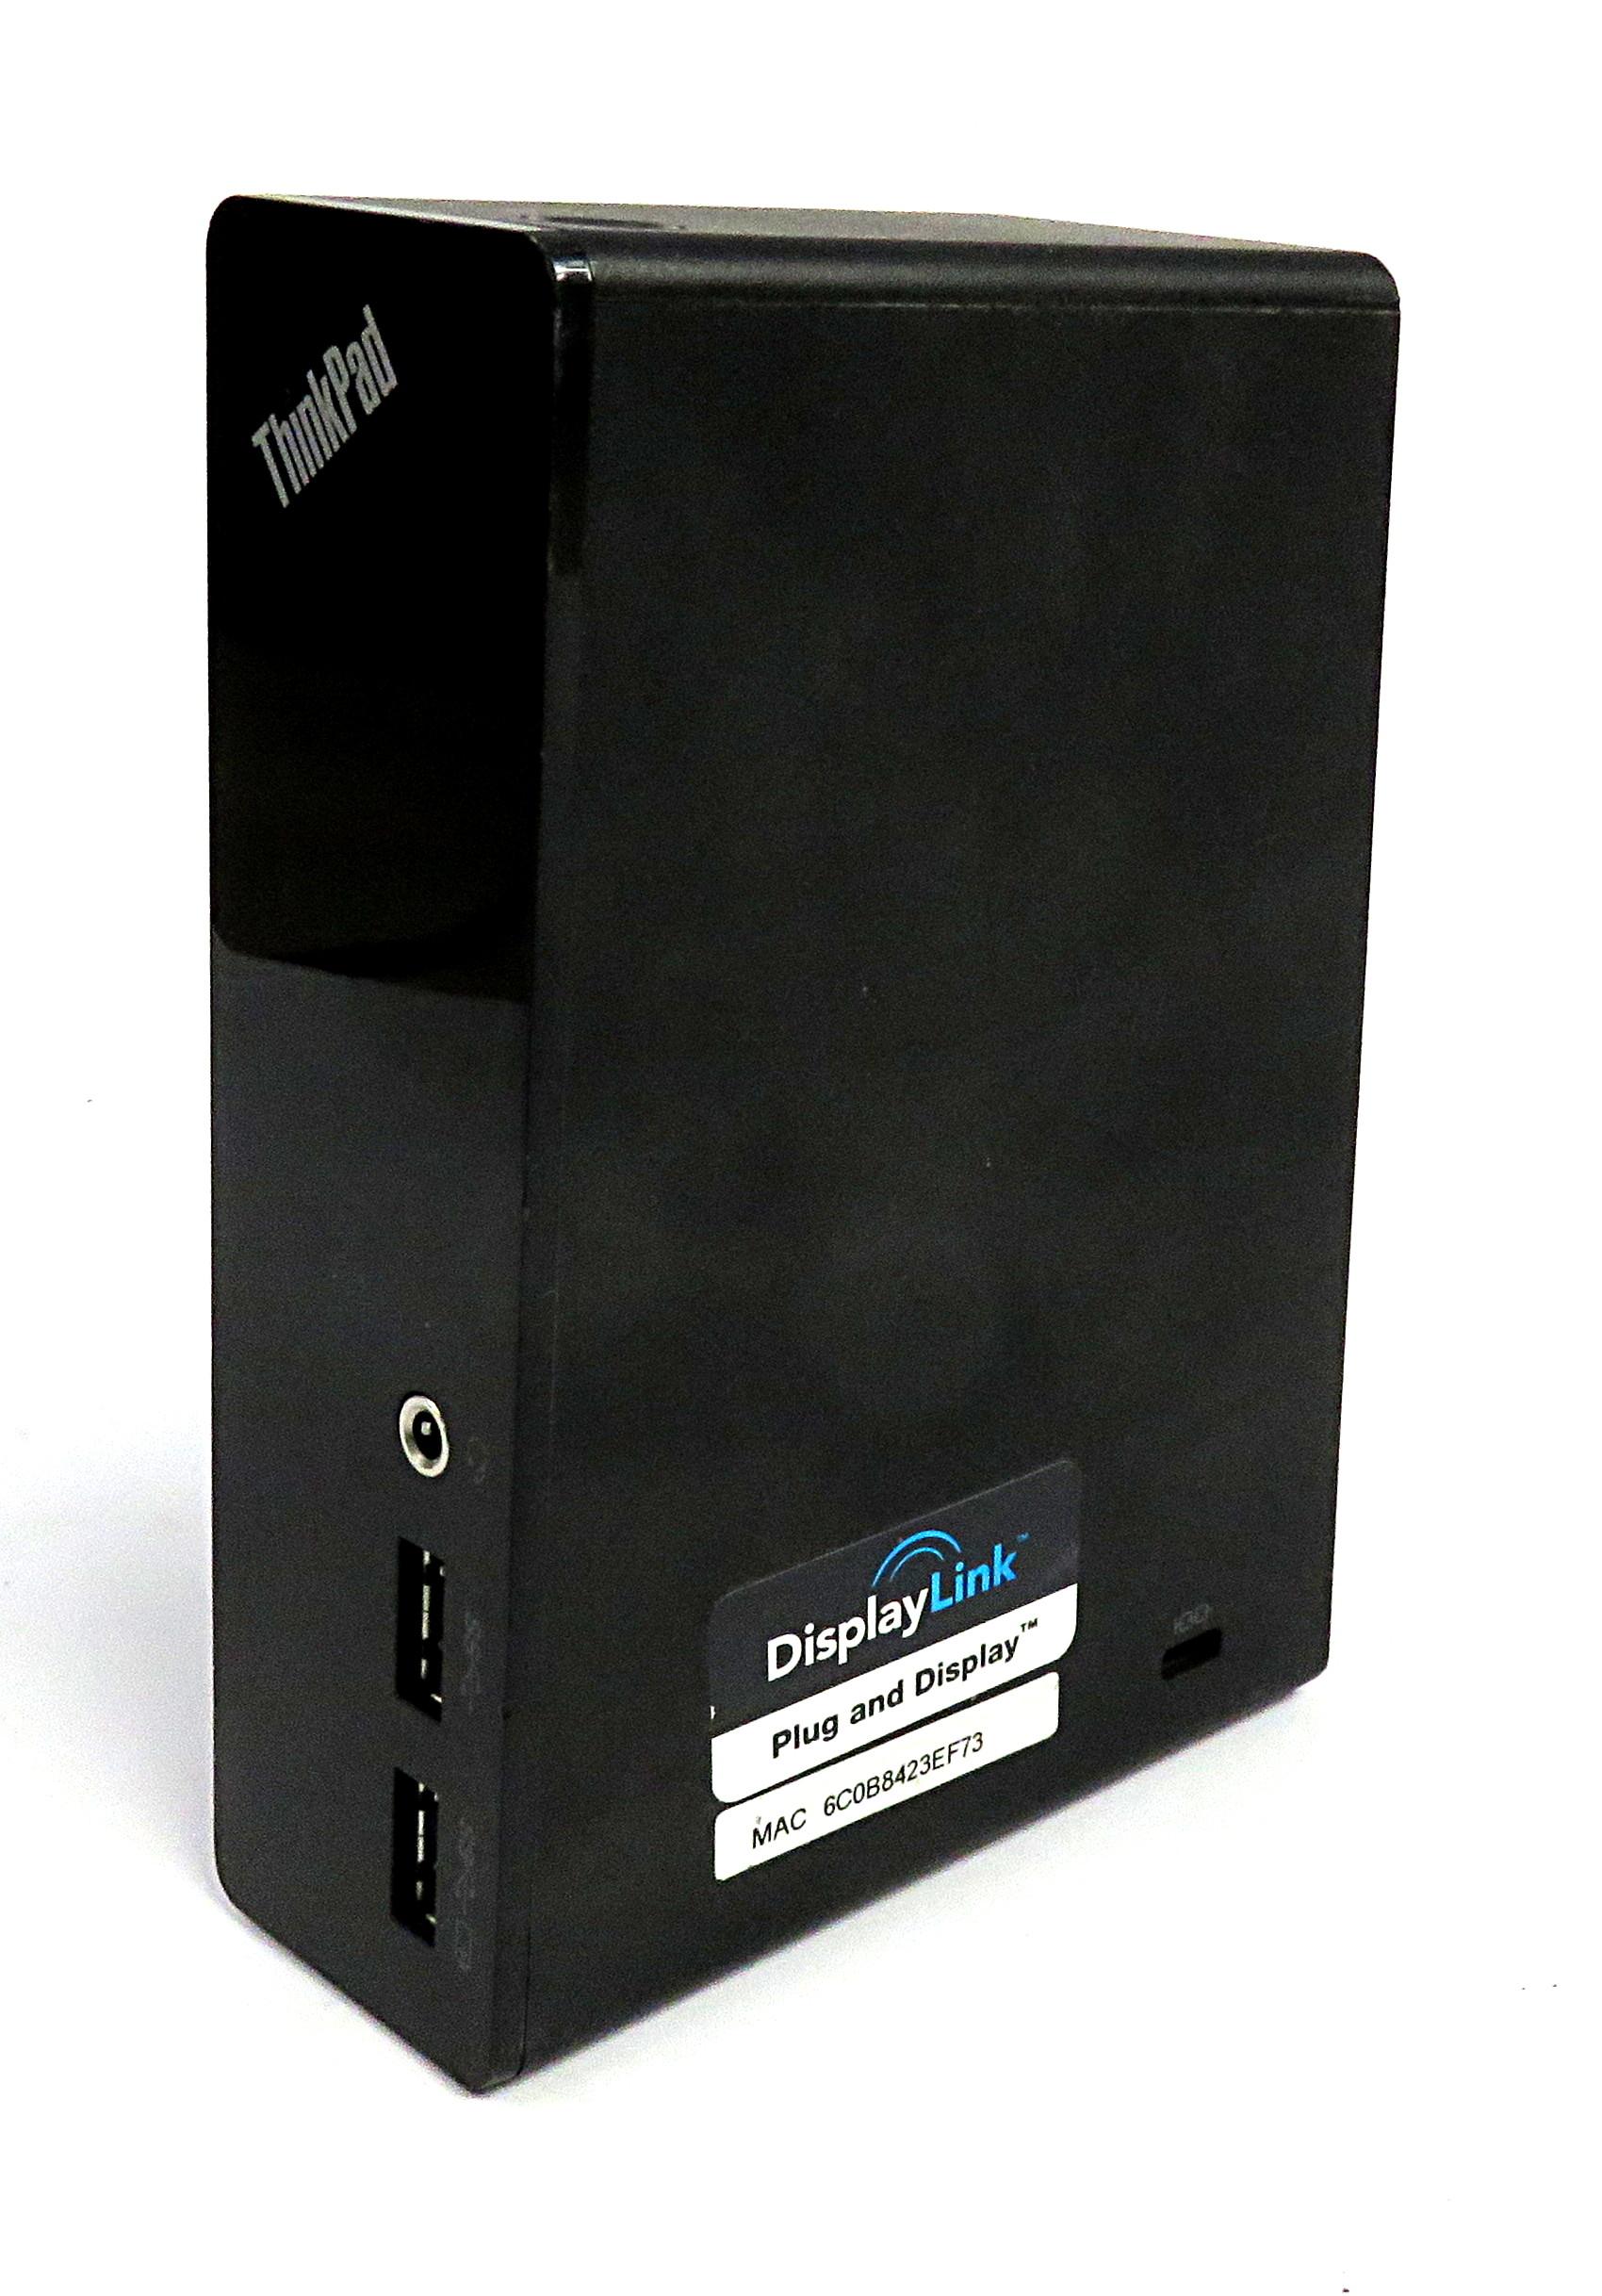 Lenovo 03X6285 ThinkPad Basic USB 3.0 Dock DL3700-ESS - Dock Only